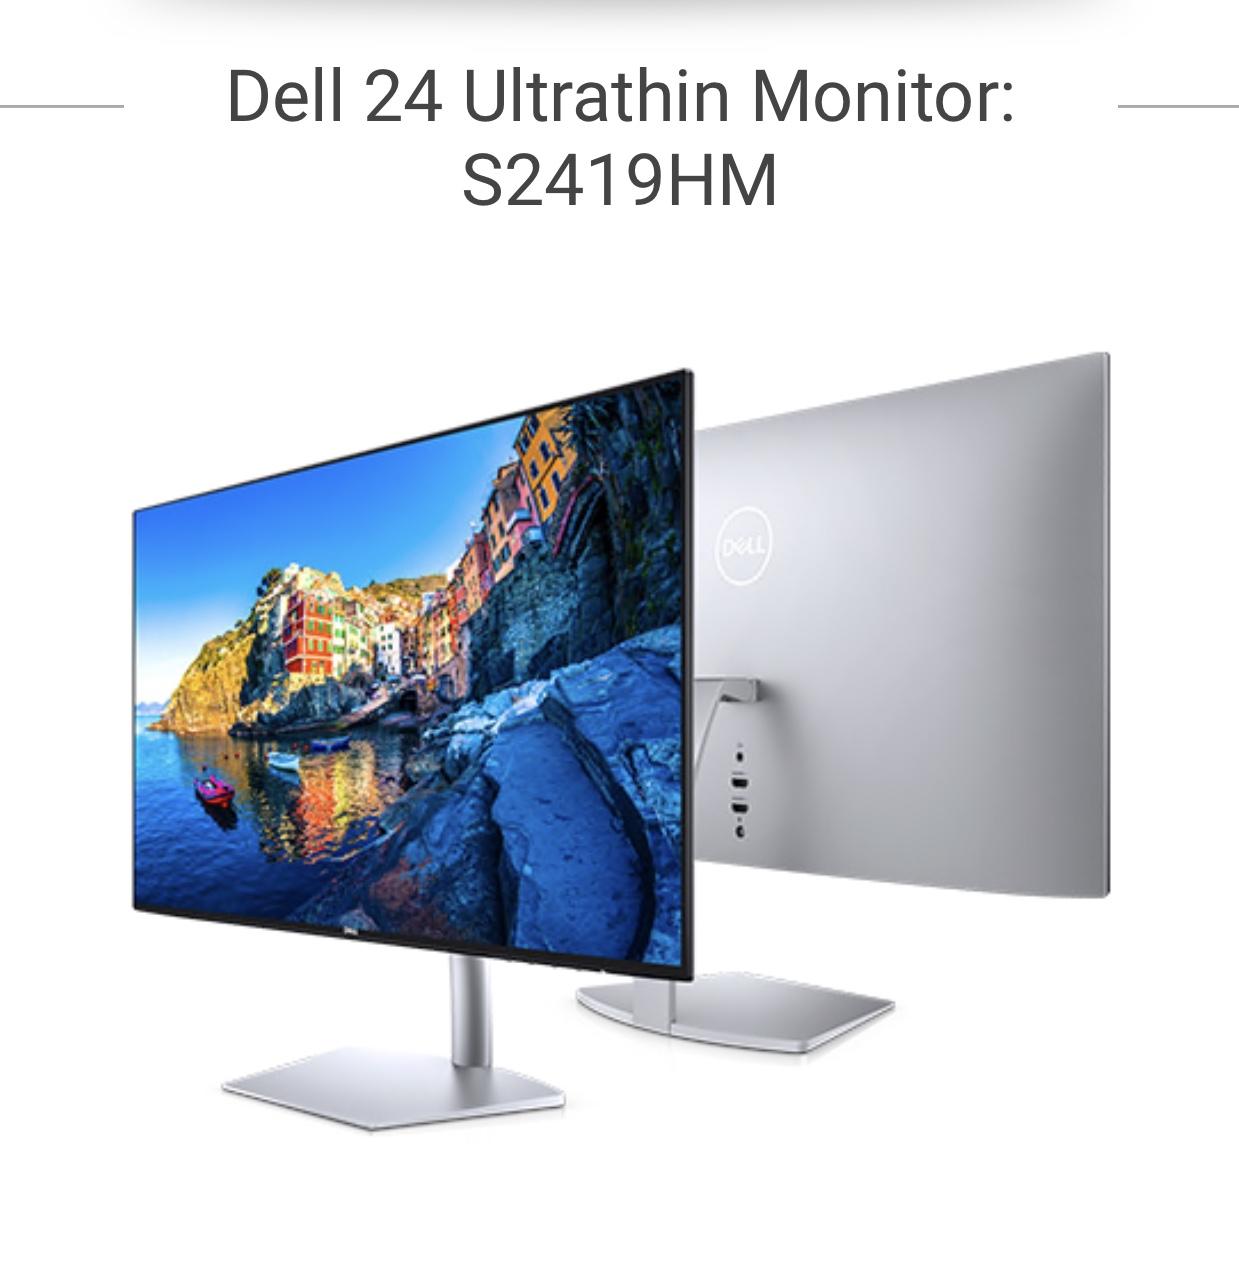 "DELL ULTRATHIN FHD HDR 24"" IPS MONITOR + 3 YEAR DELL WARRANTY - £152 @ Dell"